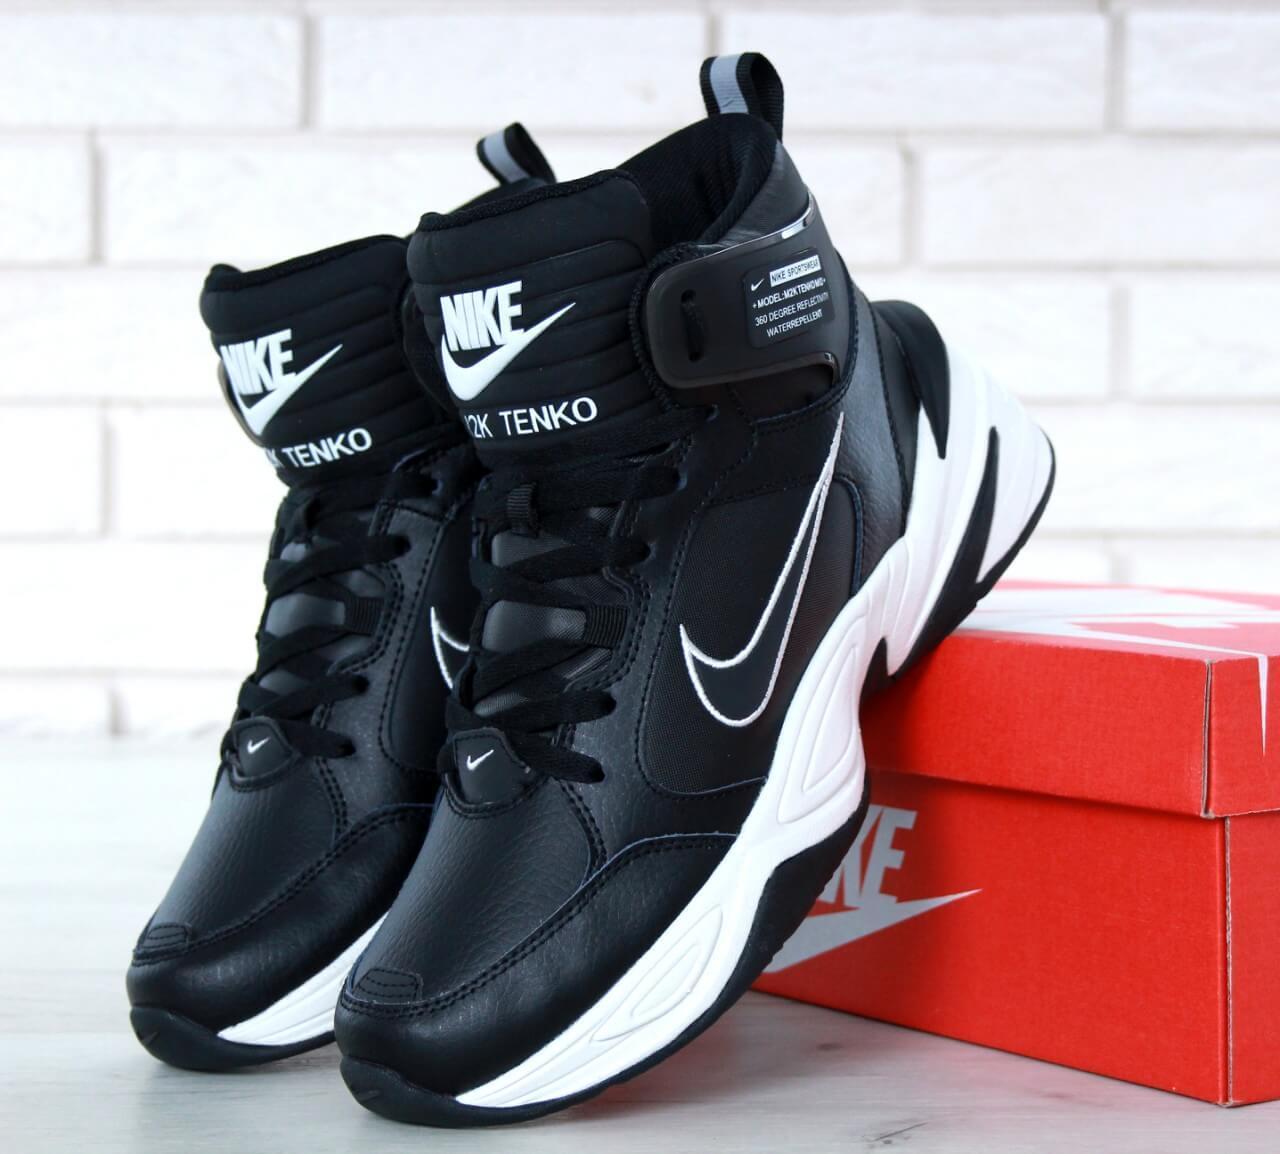 f9ea78f1 Зимние кроссовки Nike M2K Tekno High Black White Winter купить в ...